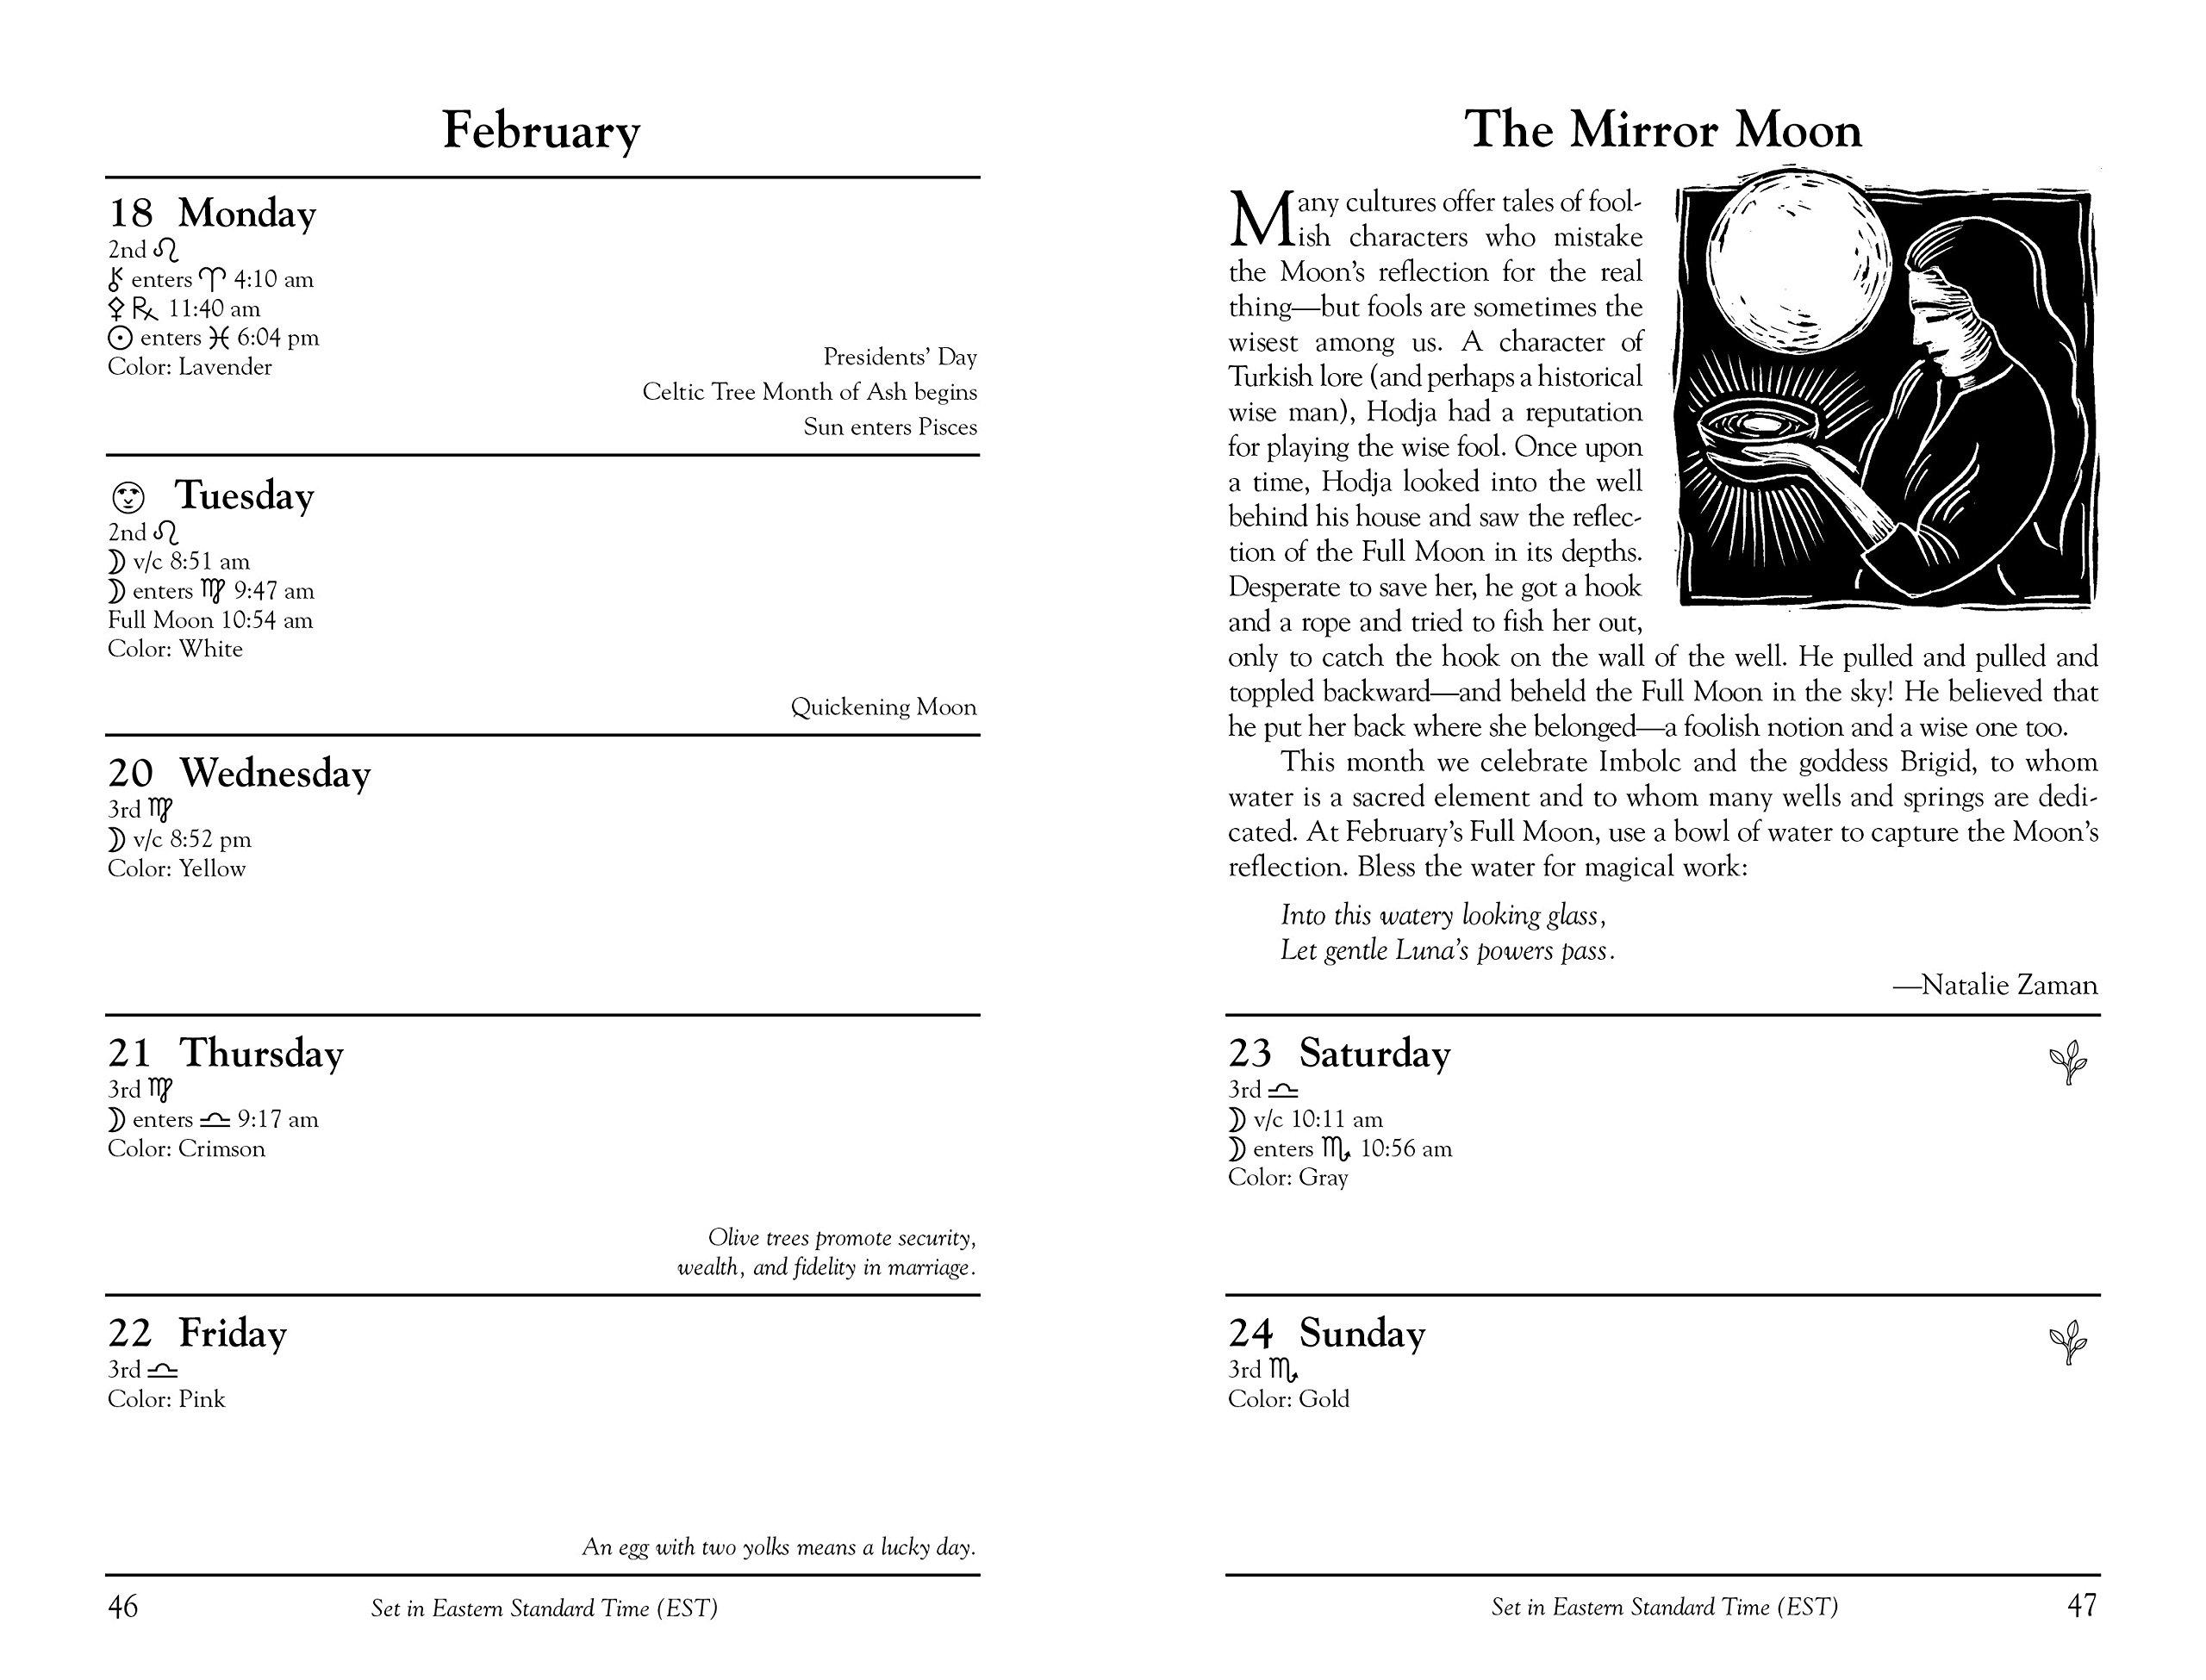 Heidnische Wiccan-Dating-Seiten